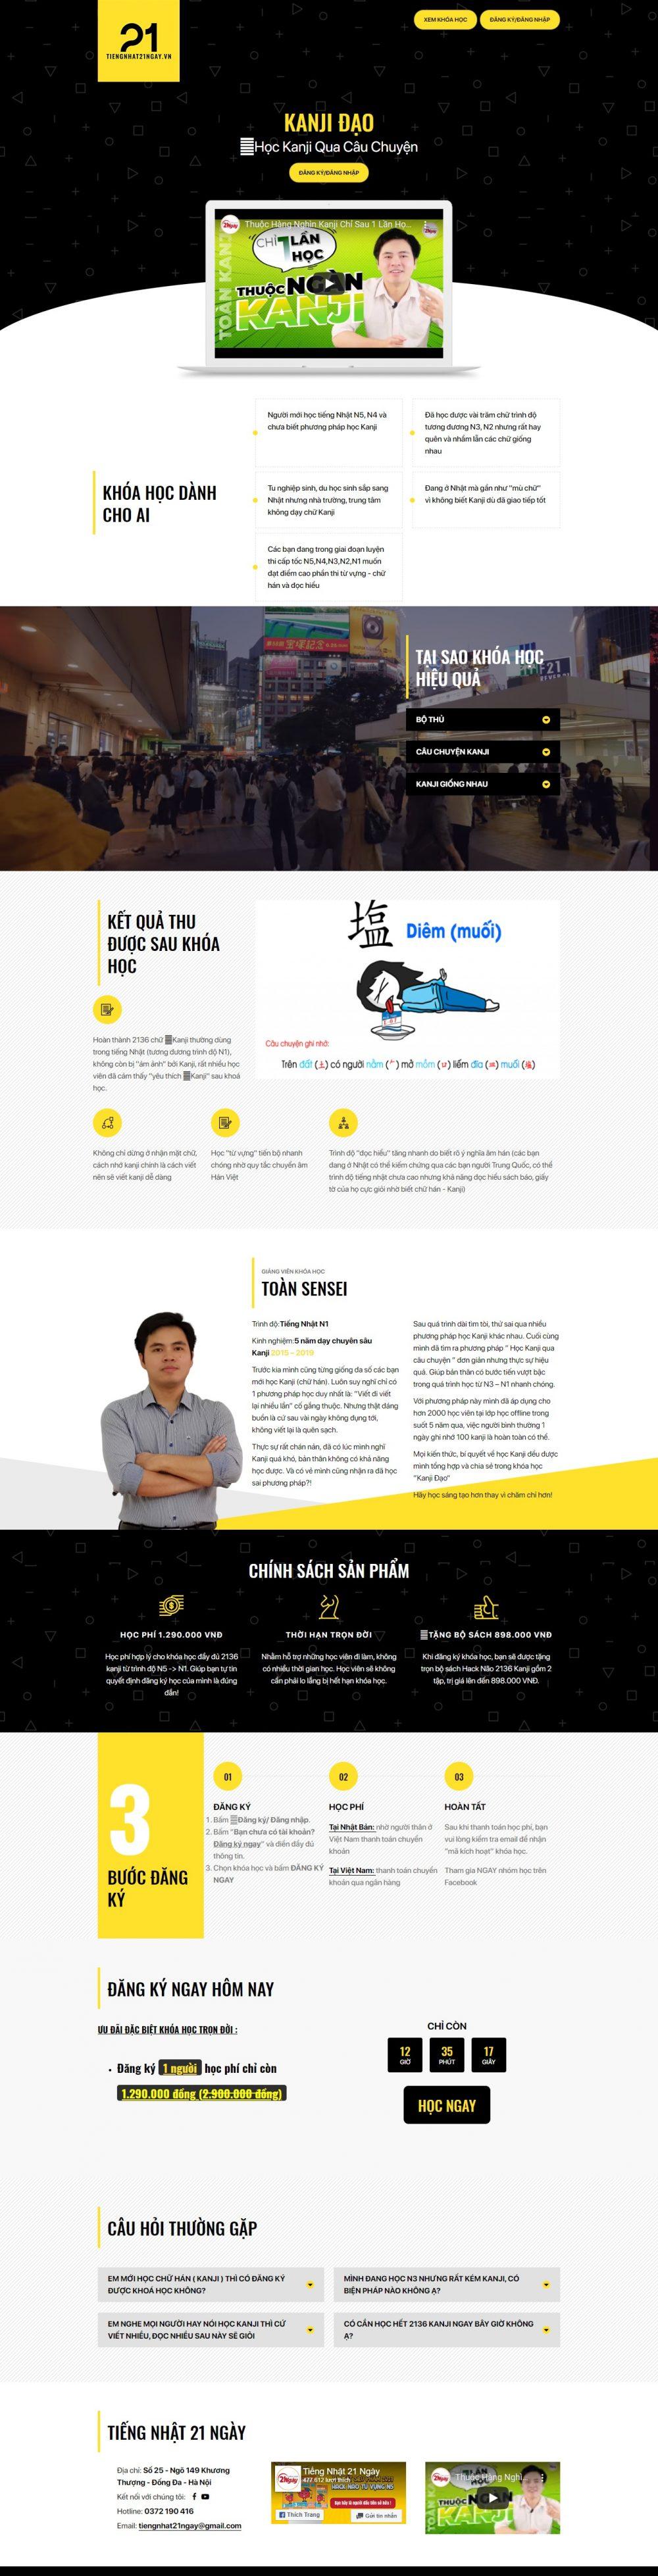 Kanjidao – Học tiếng Nhật online